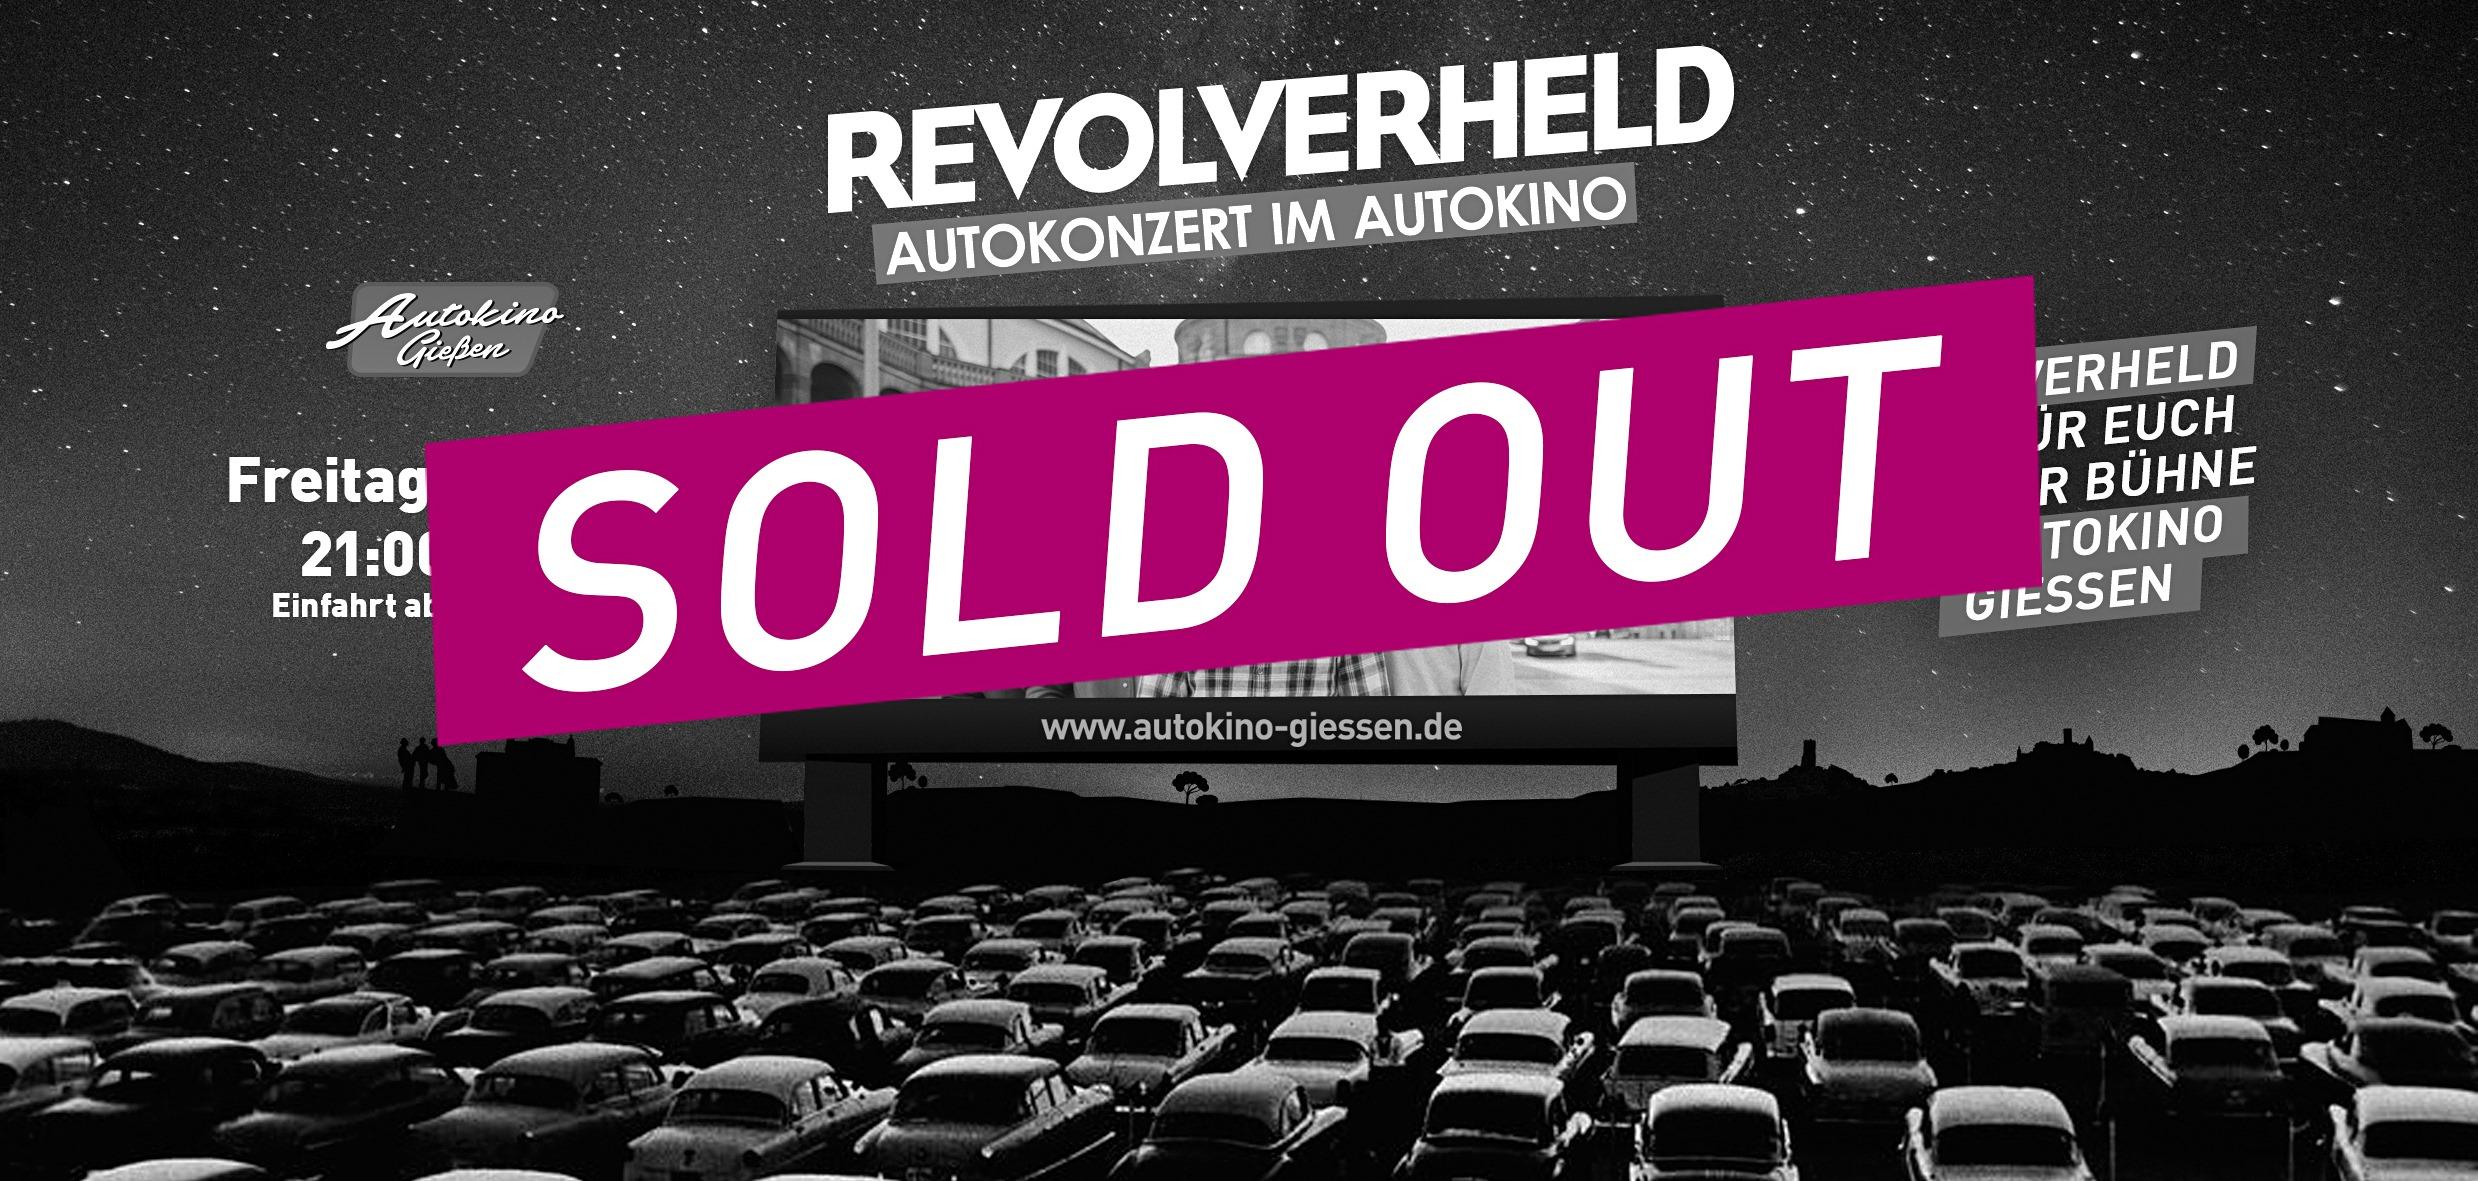 Revolverheld – Autokonzert im Autokino